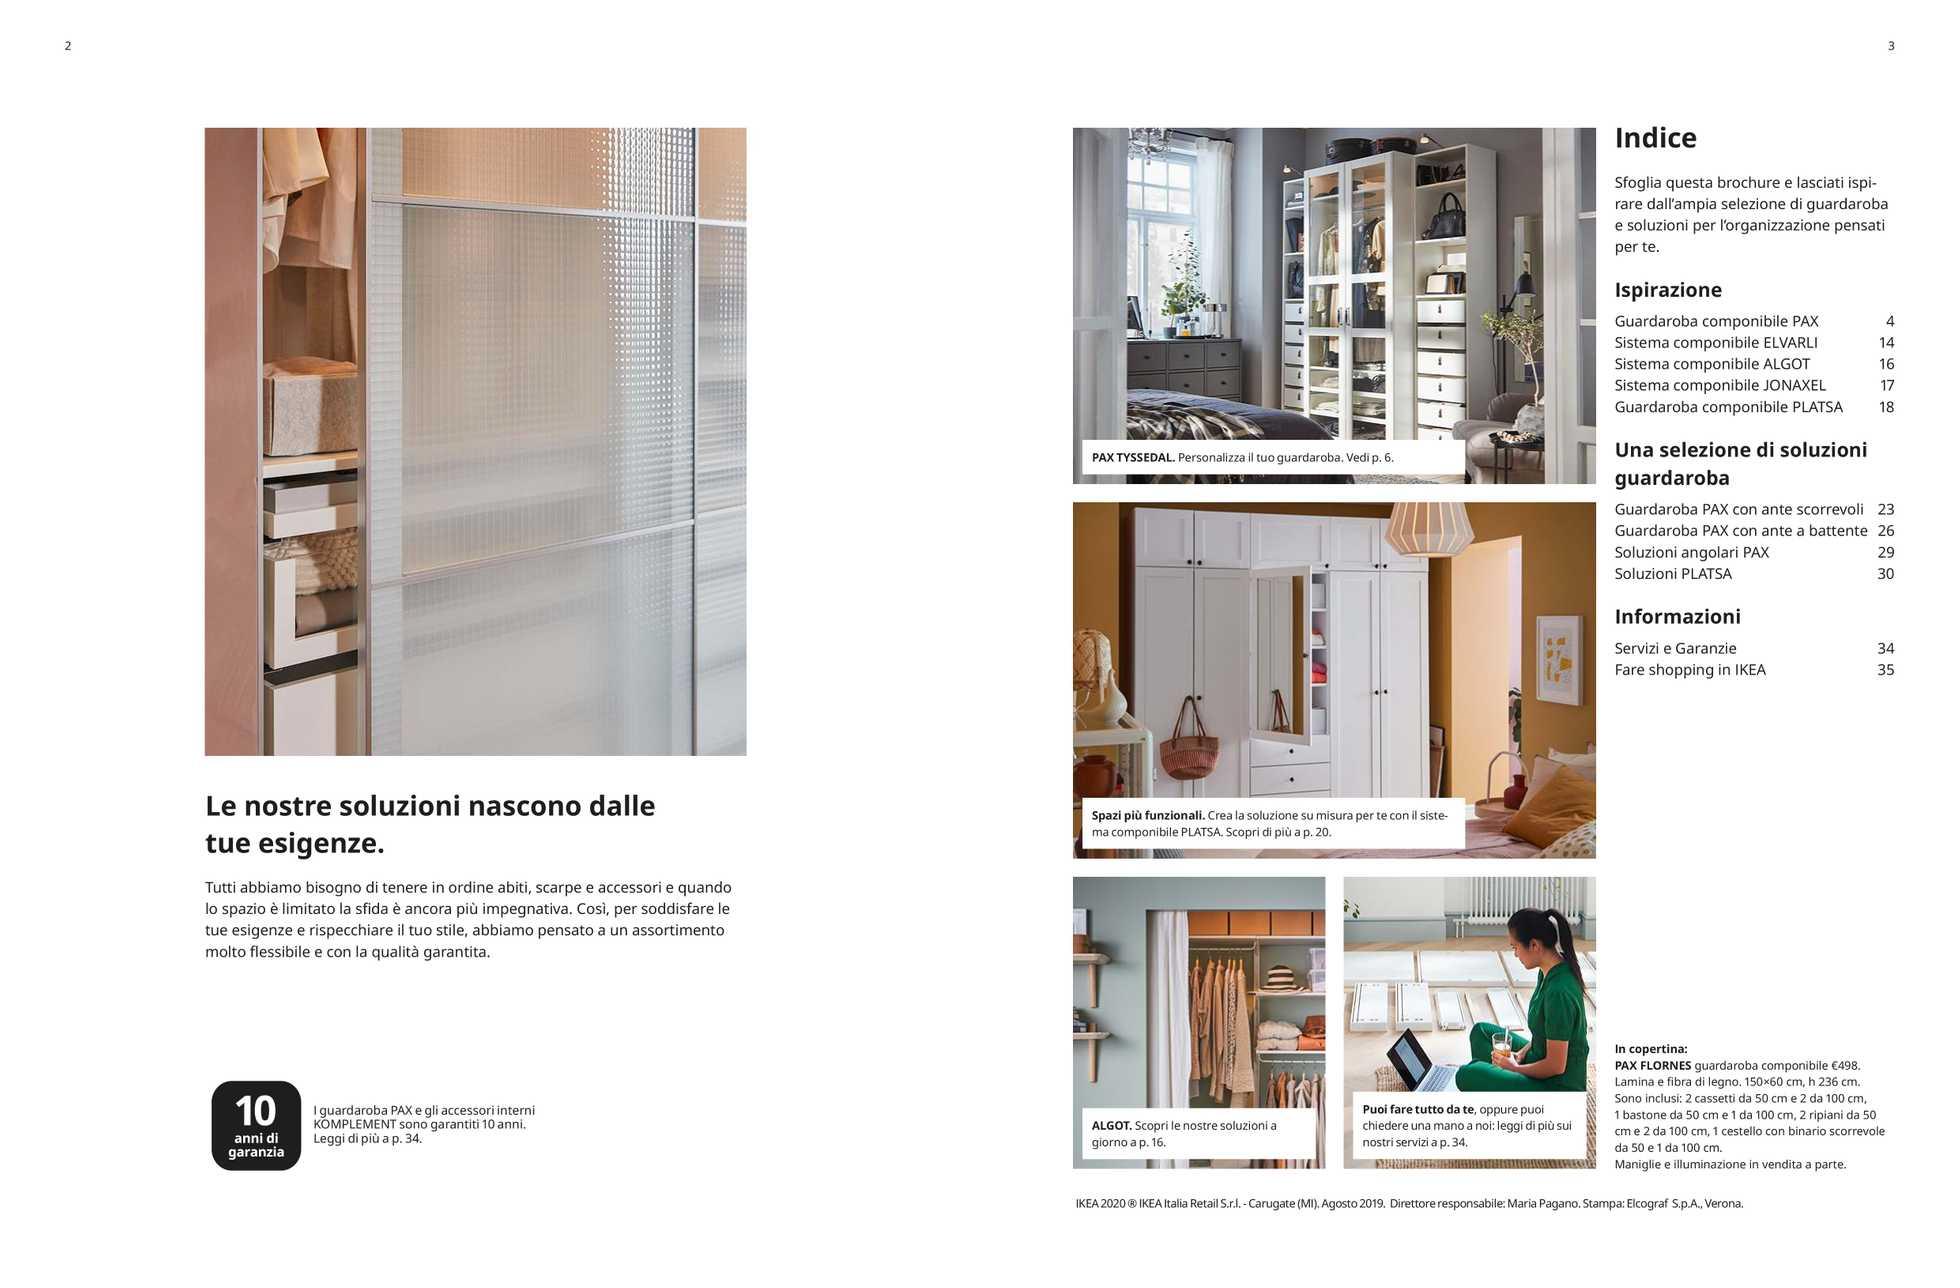 Catalogo Armadi Ikea 2019 Ante Scorrevoli.Volantino Ikea Le Ultime Offerte It Promotons Com